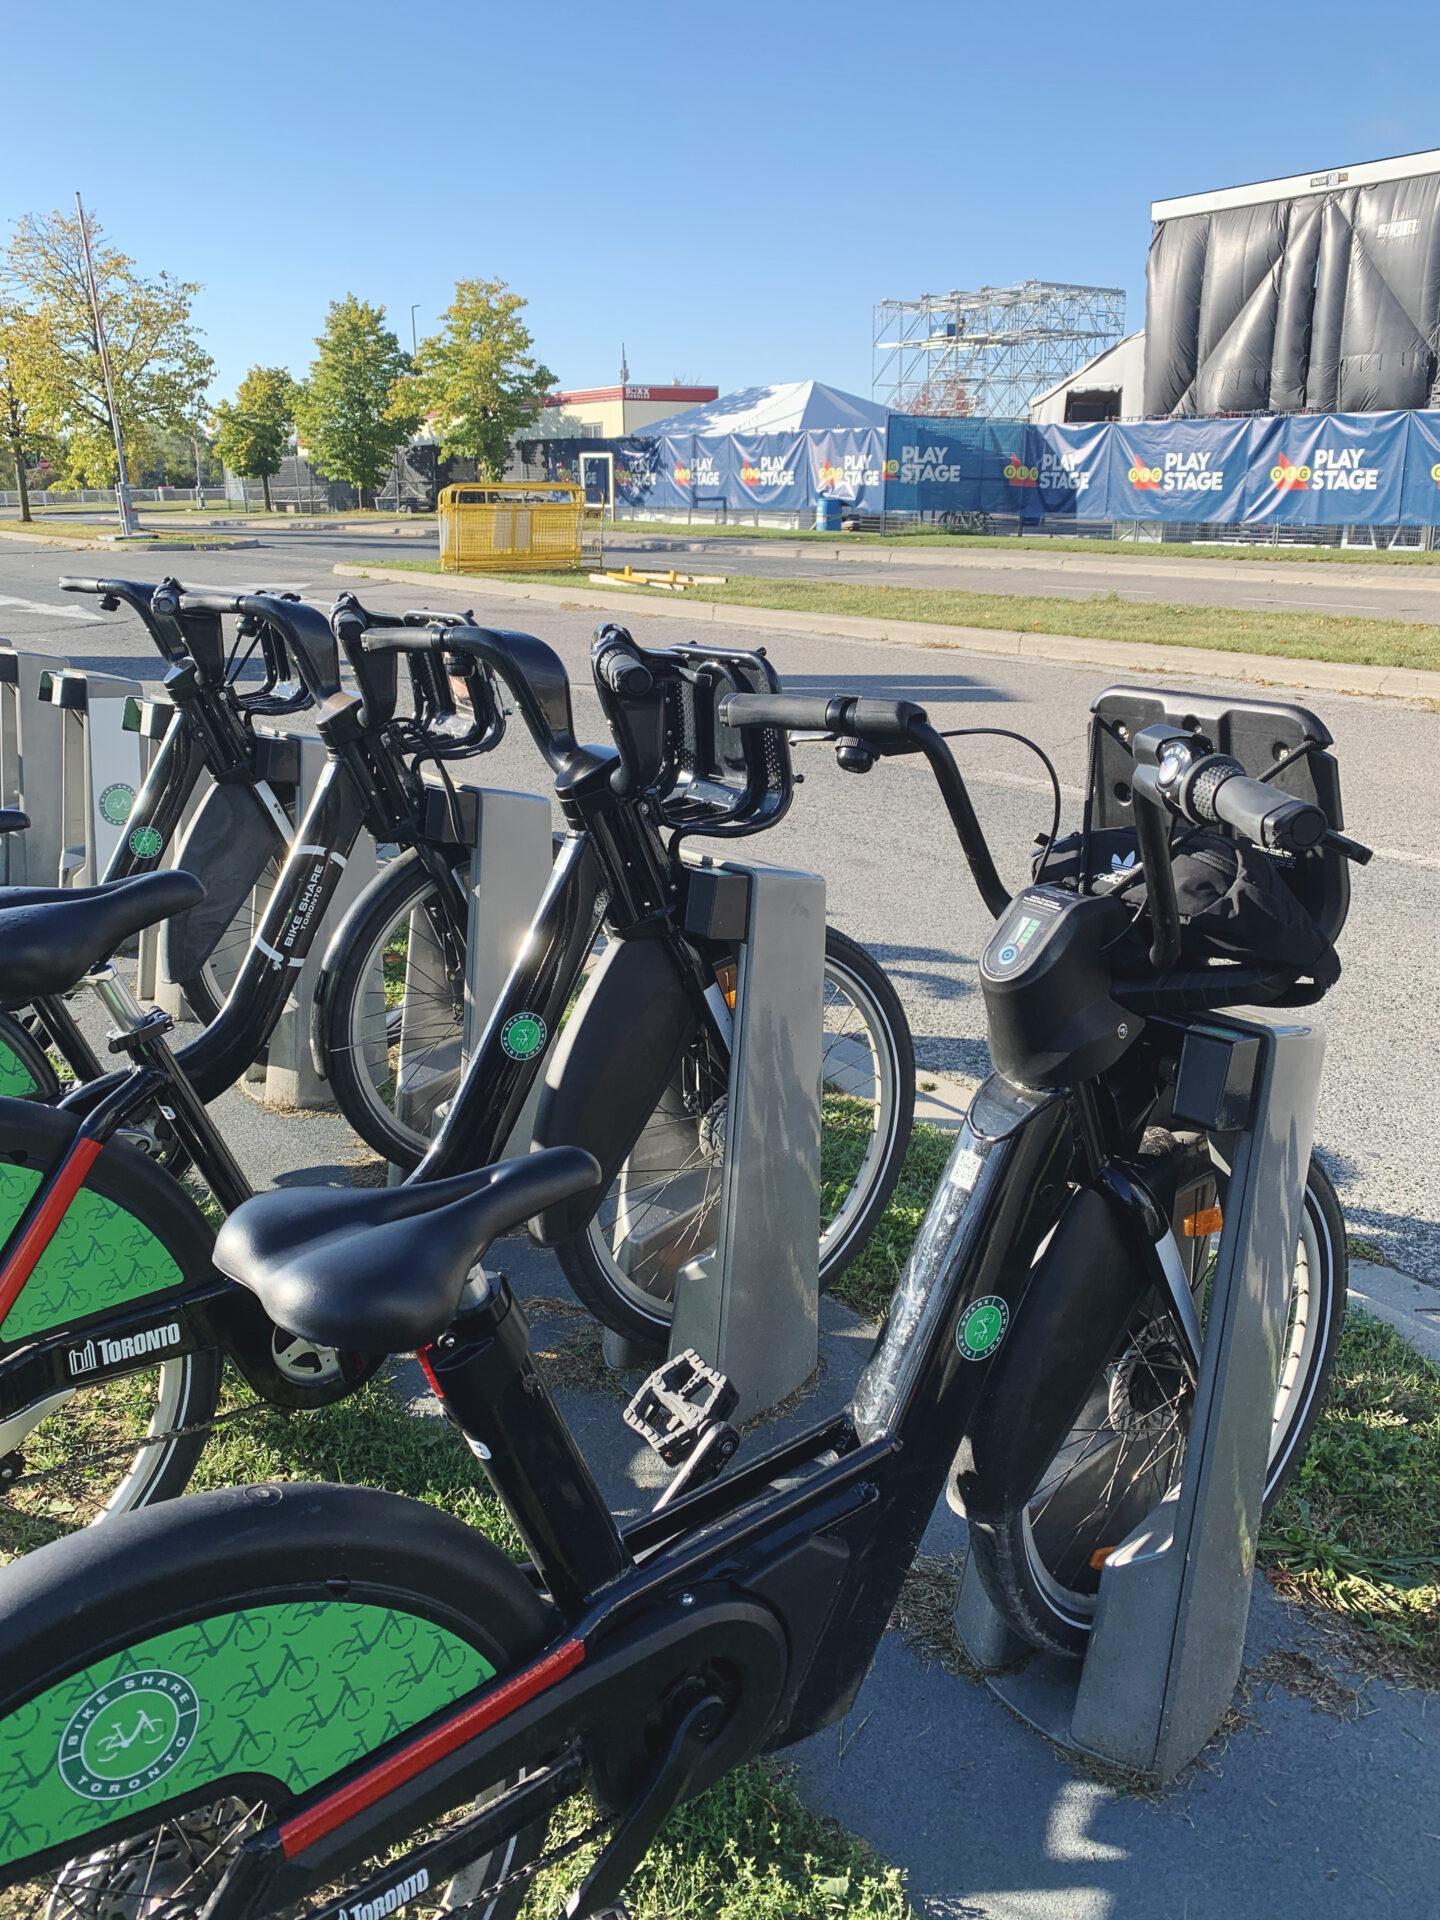 Bike Share electric bike rental at Ontario Place, Toronto